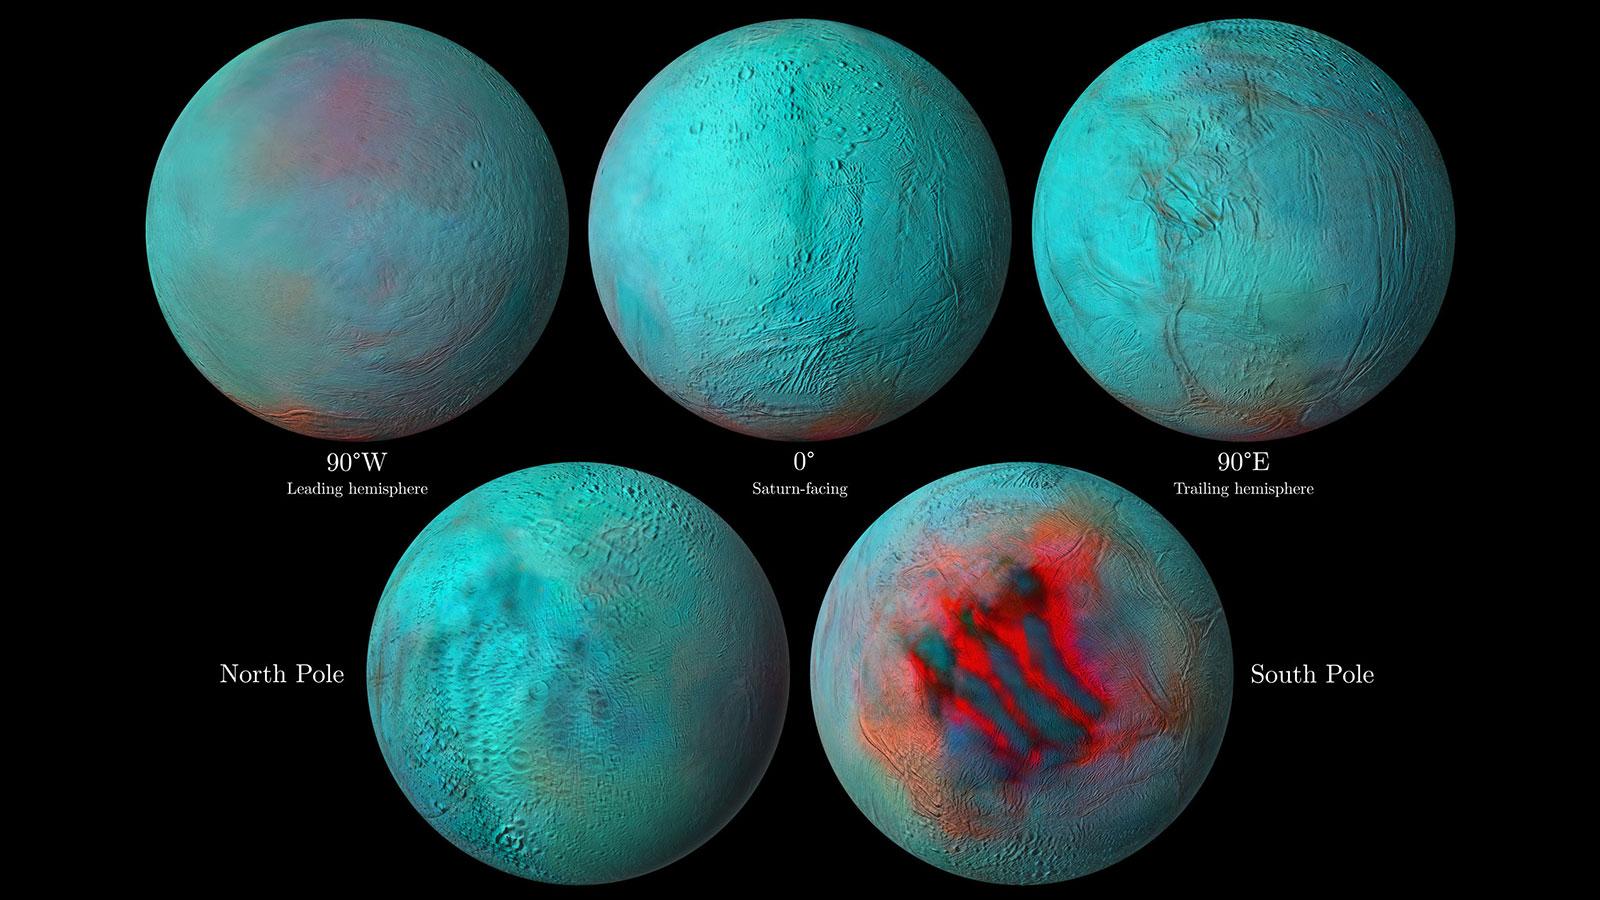 Создана интерактивная карта спутника Сатурна